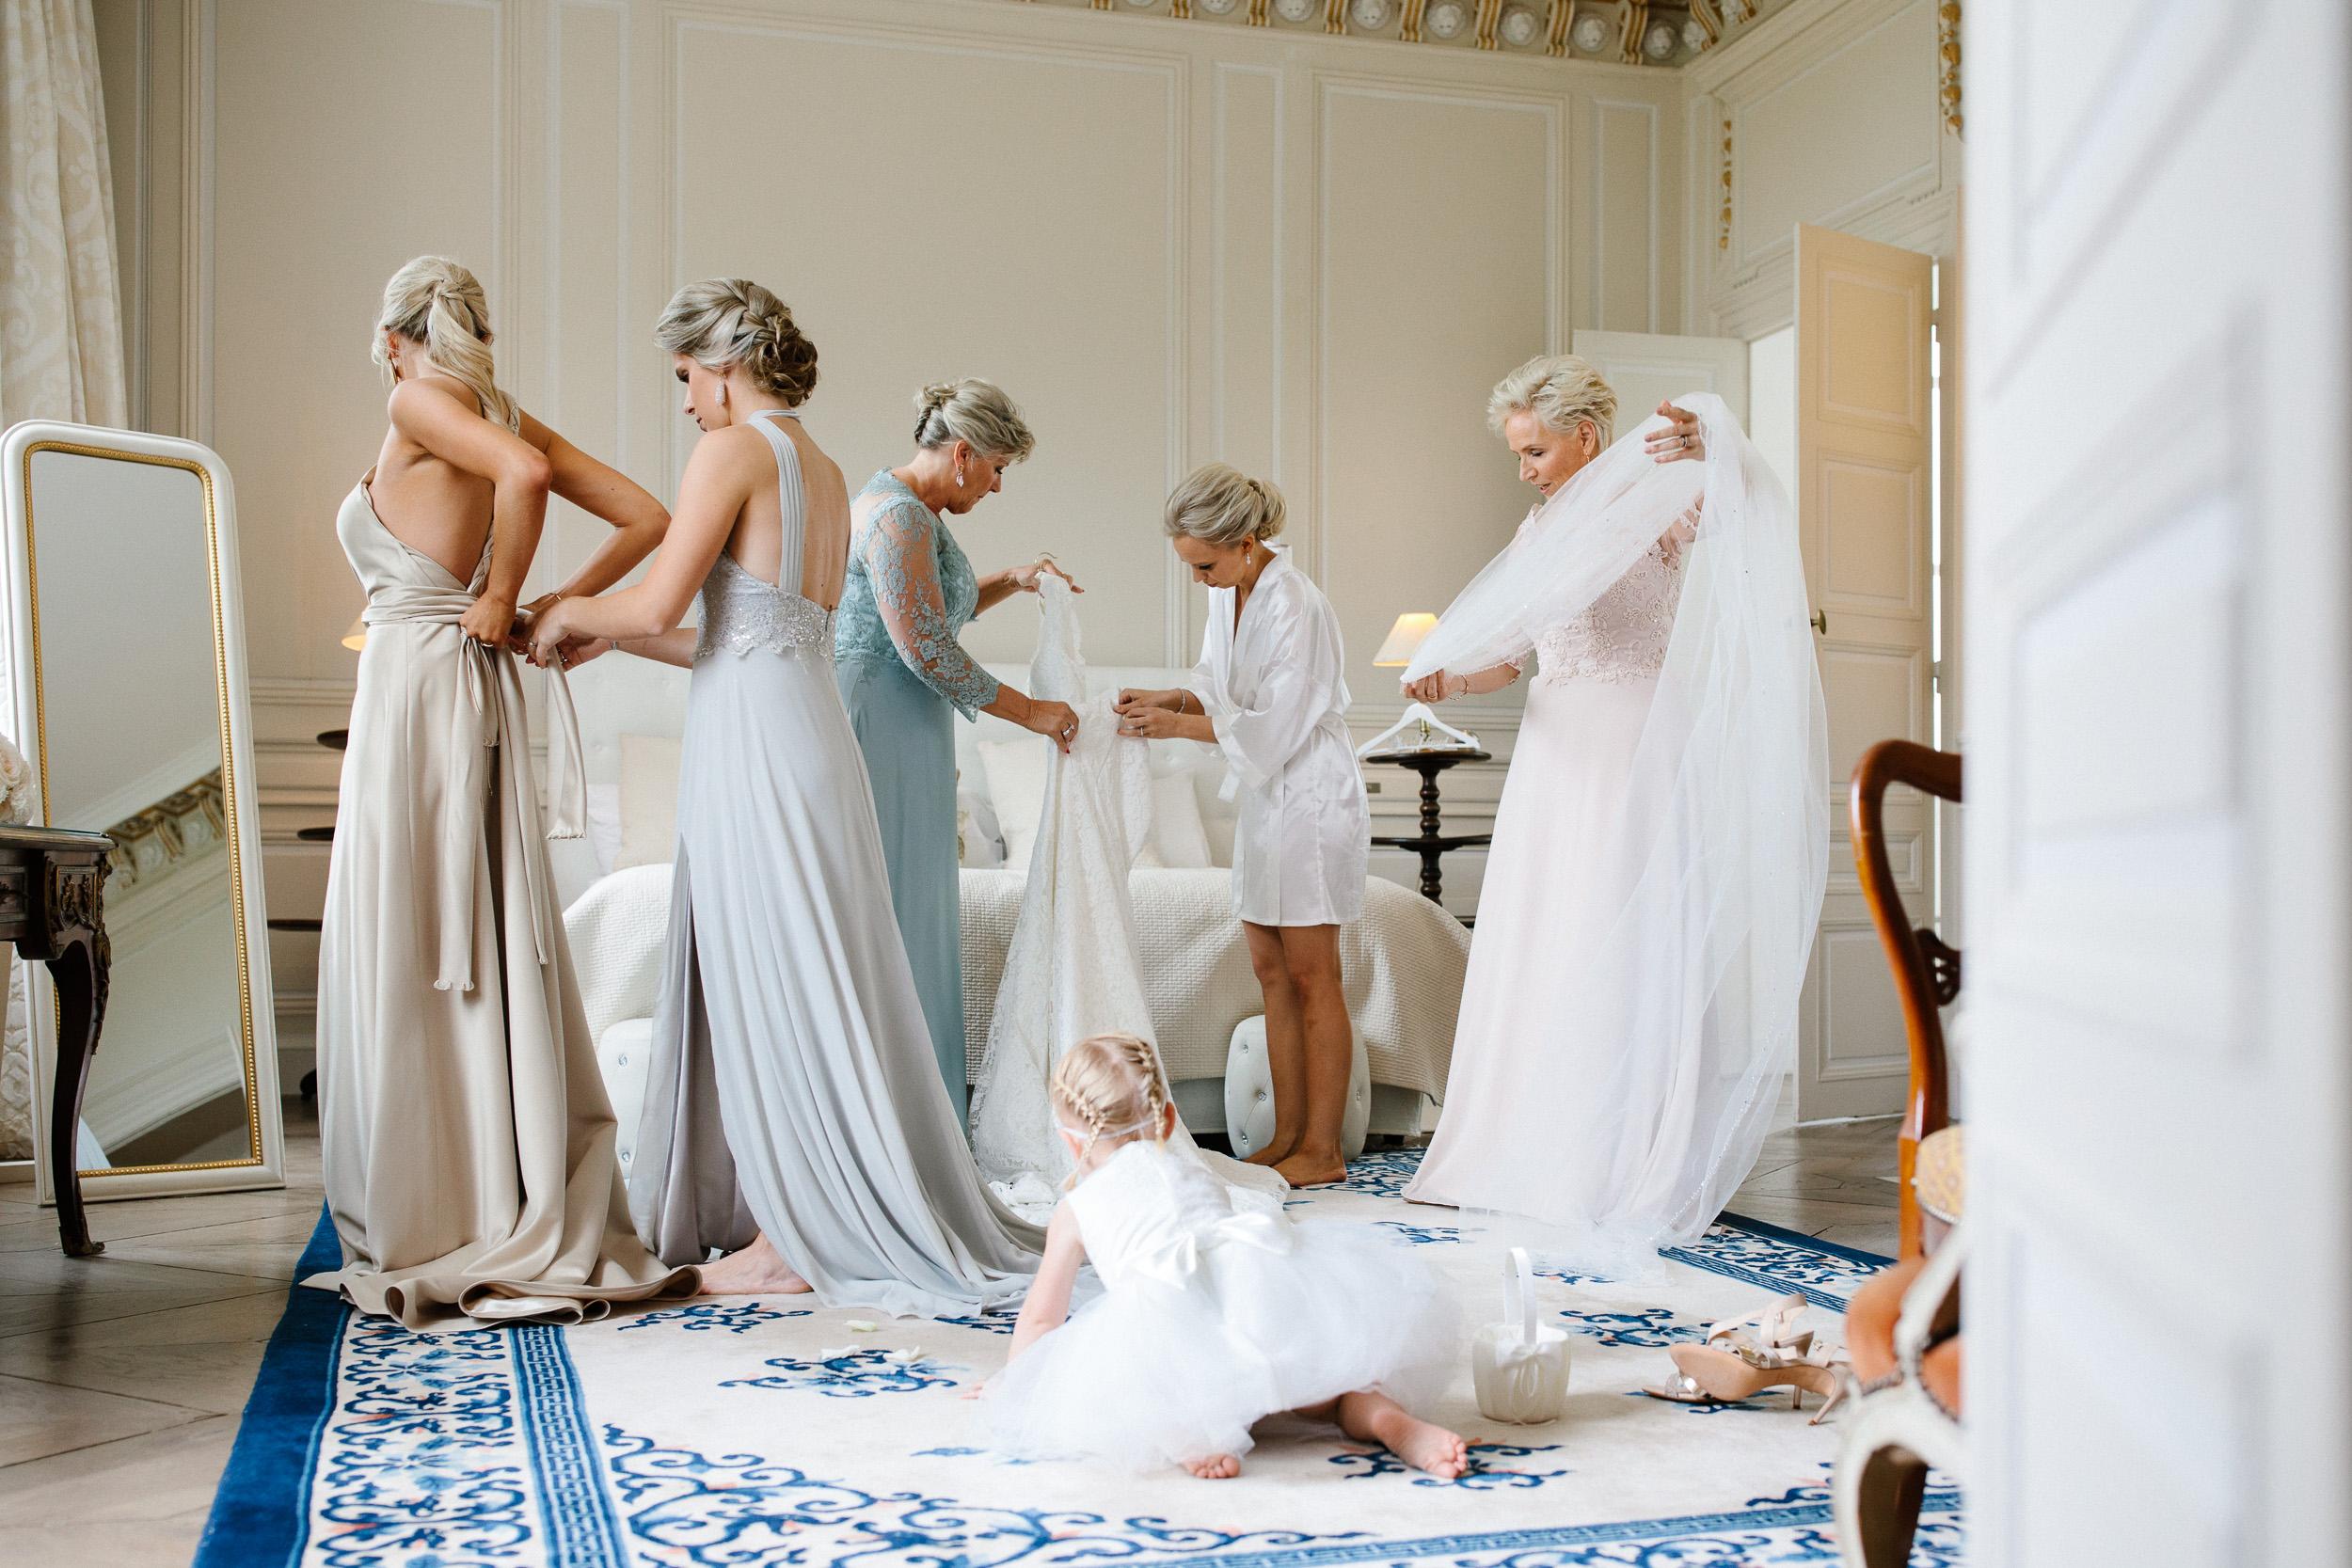 Wedding-Chateau-de-Varennes-032.jpg